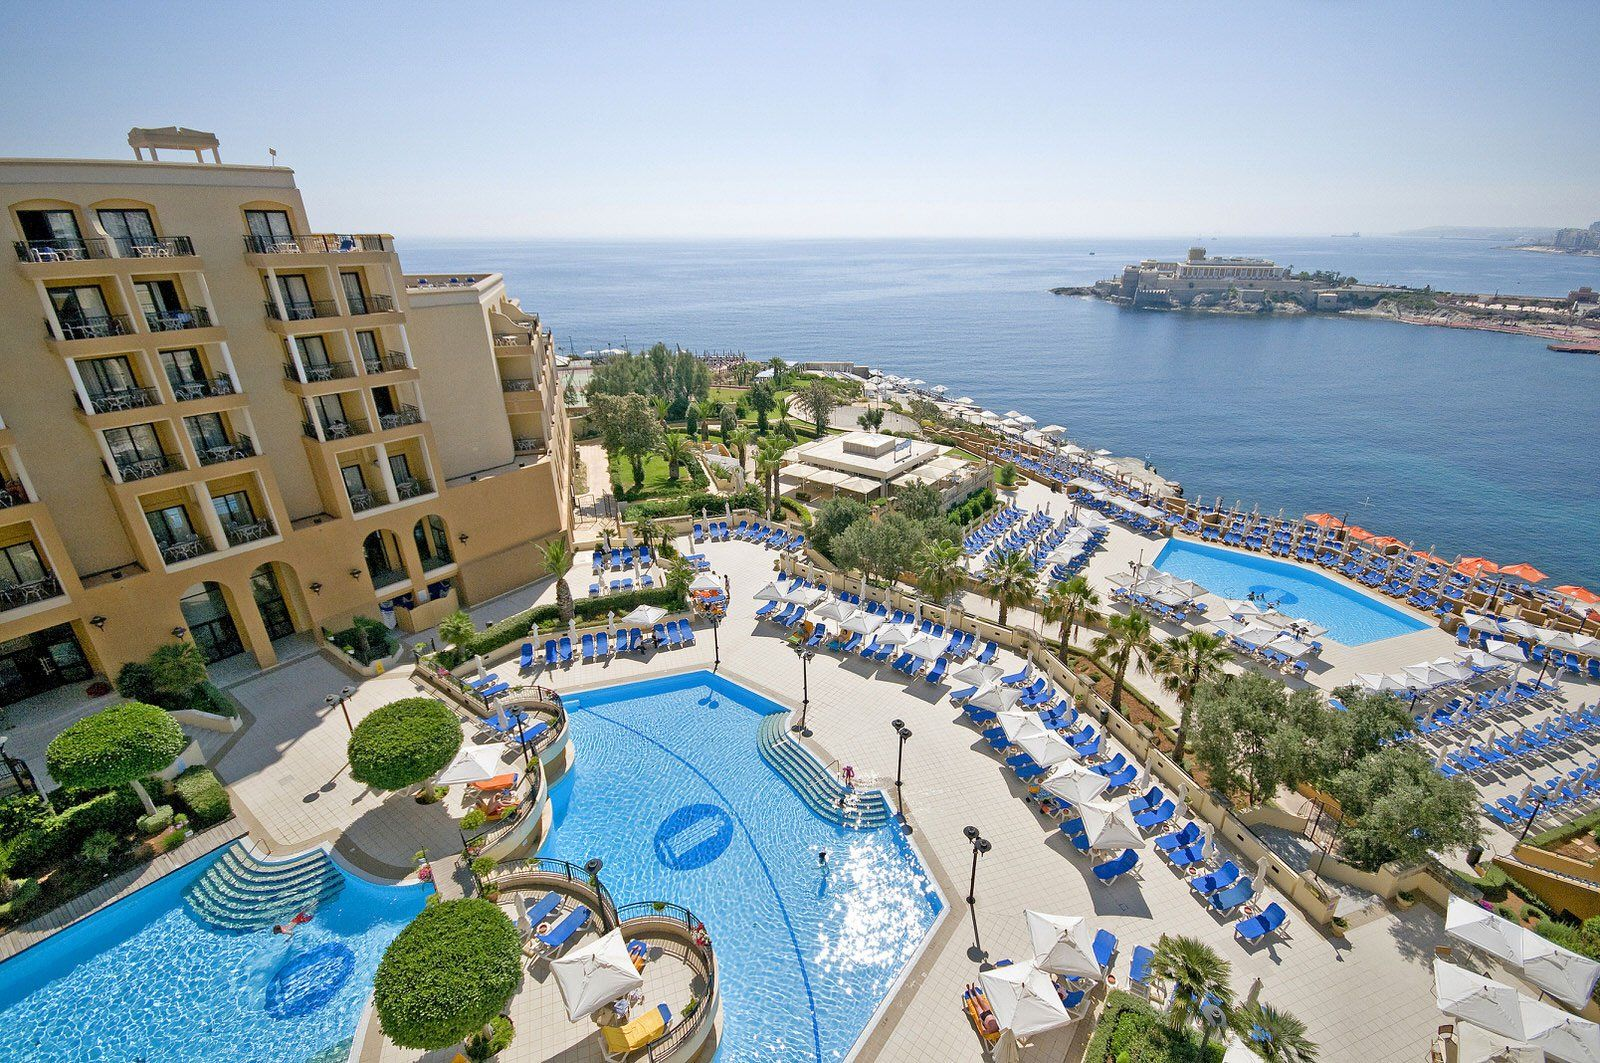 Marina Hotel At The Corinthia Beach Resort, St Julians